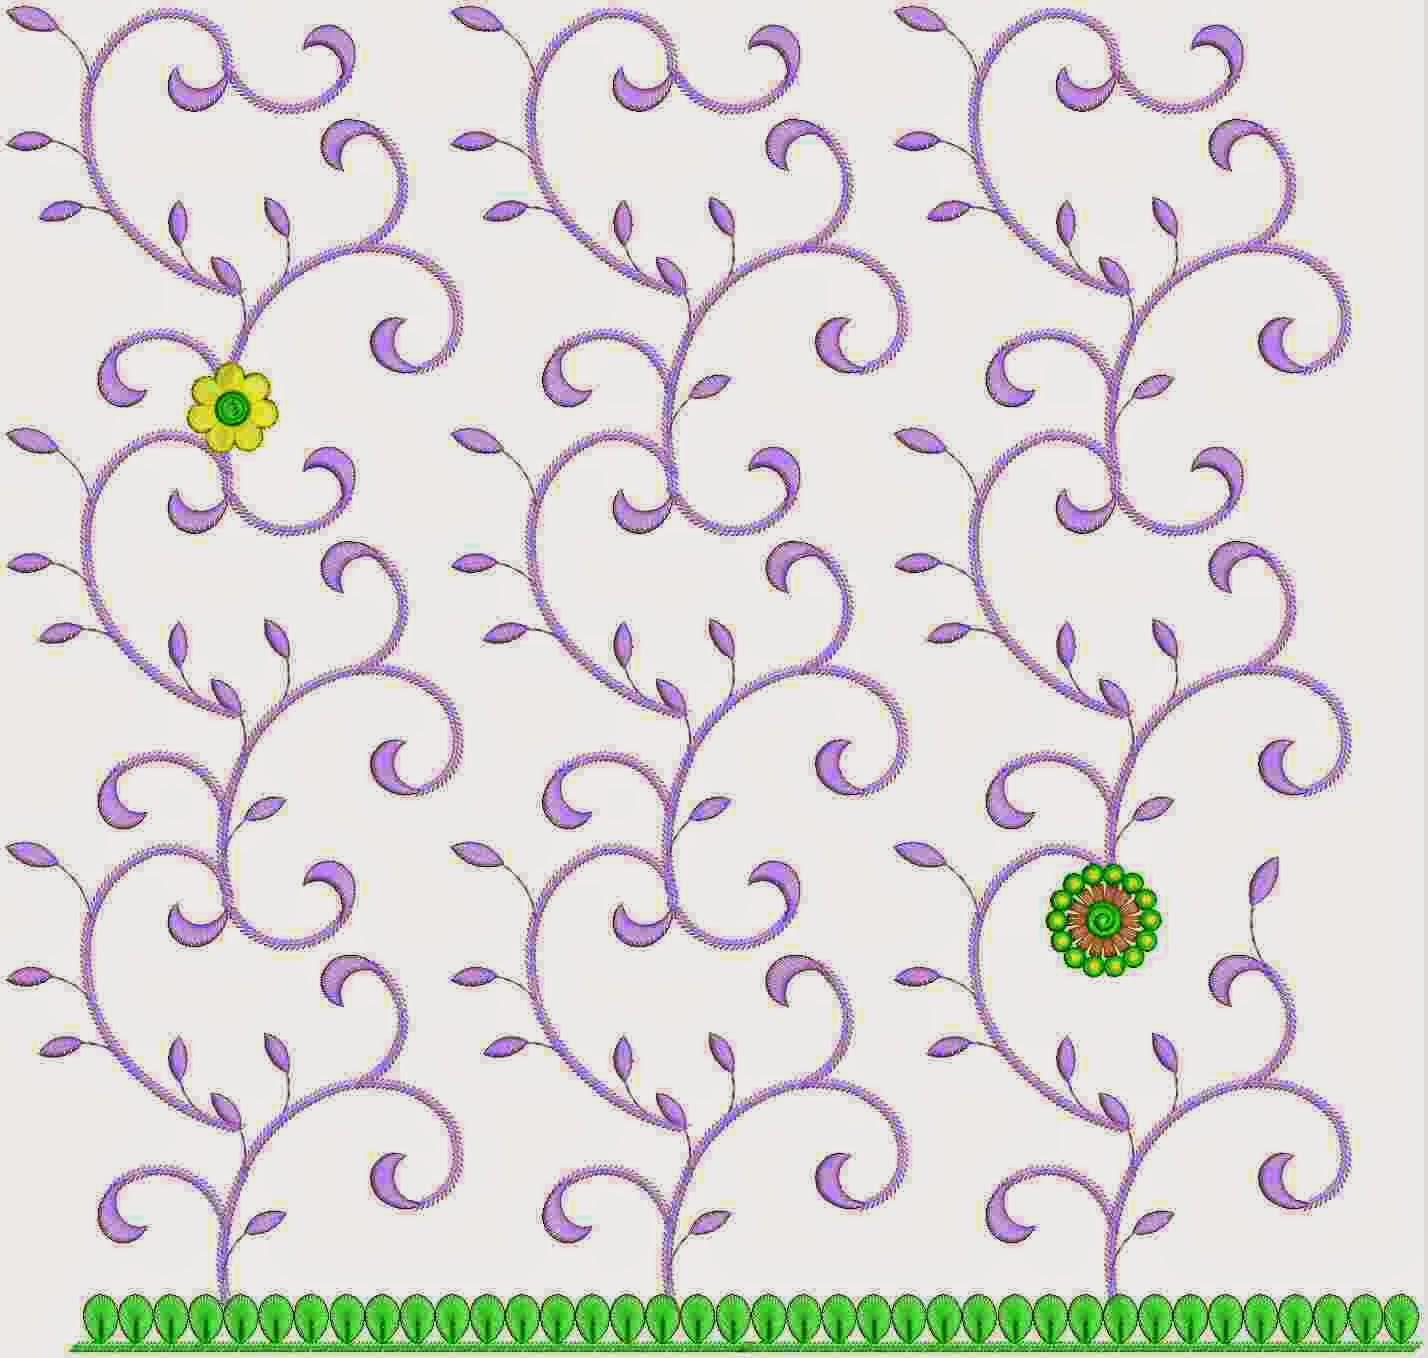 gratis cutwork masjien borduurwerk Kort Dupatta